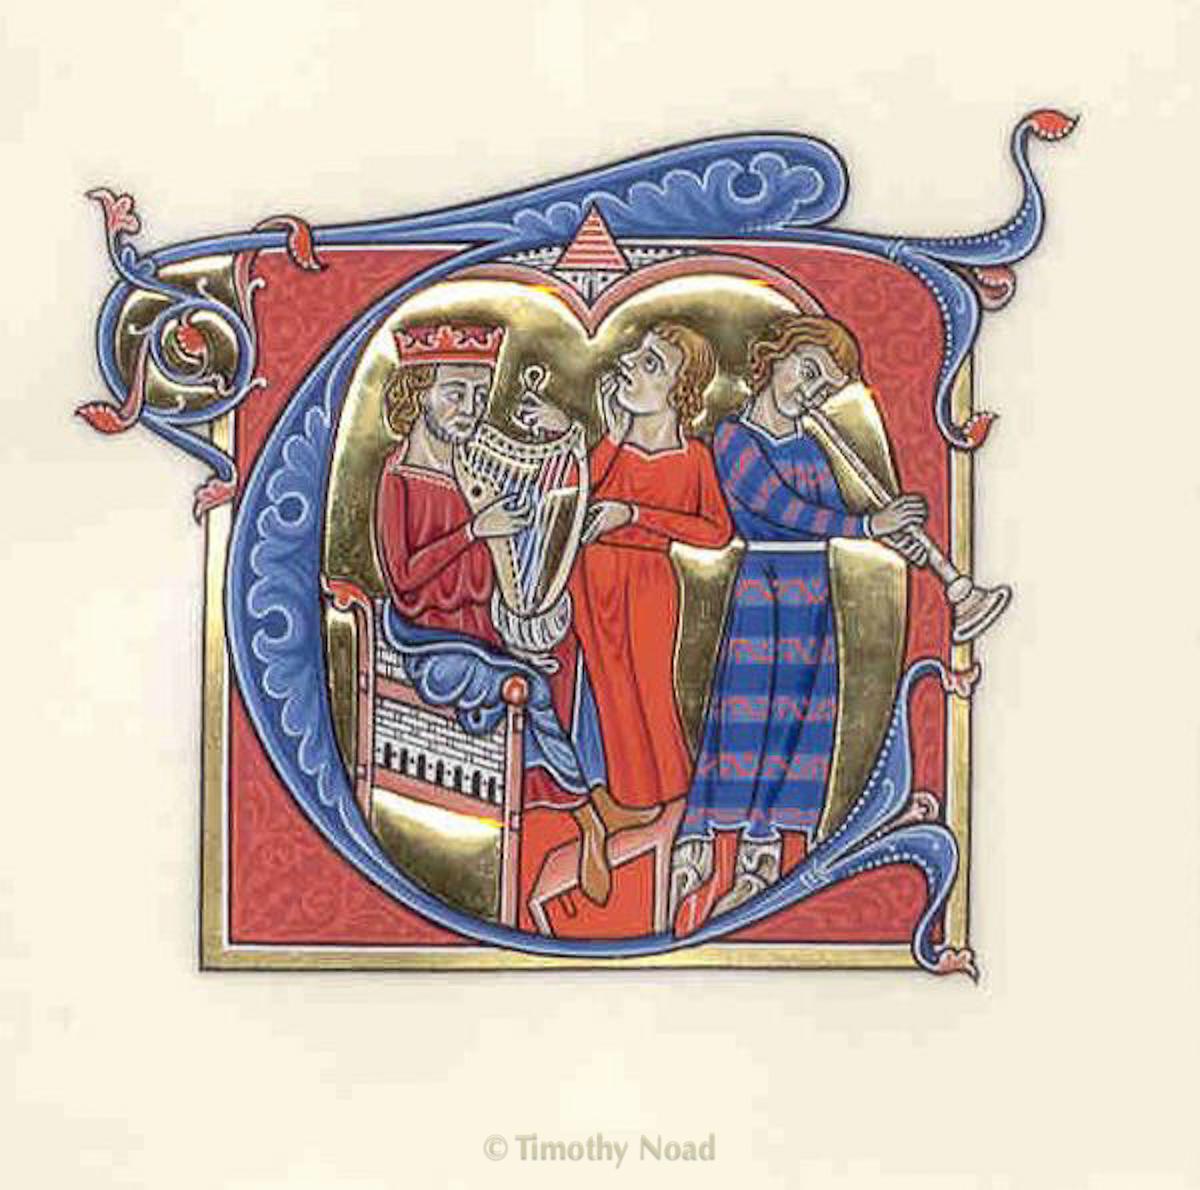 Rutland Psalter historical